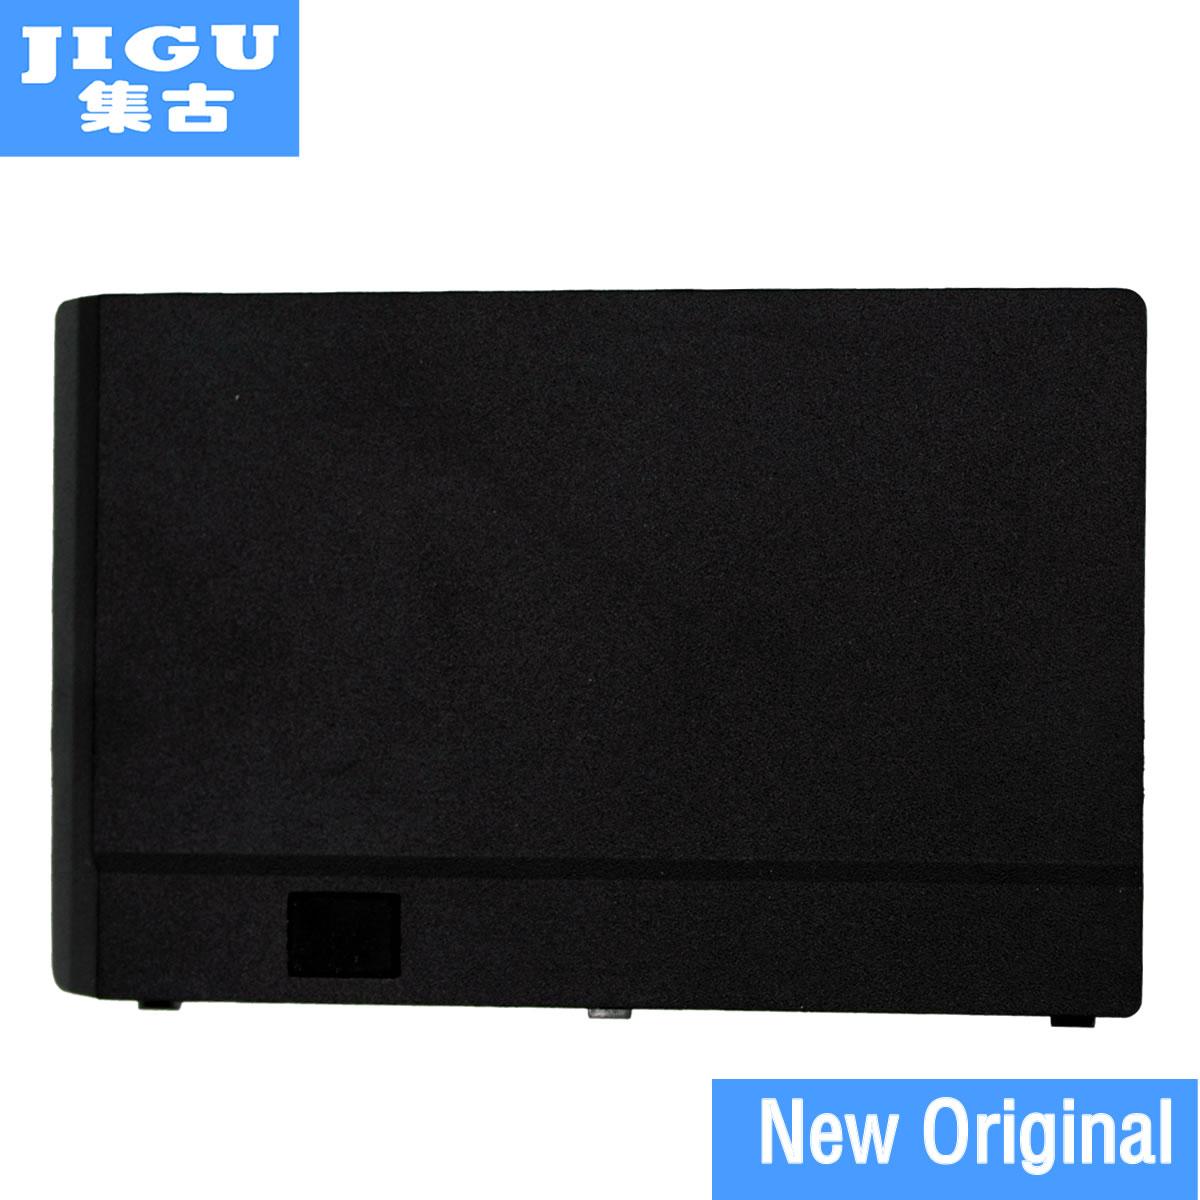 JIGU laptop battery 6-87-W370S-427 6-87-W370S-4271 6-87-W37ES-427 6-87-W37SS-427 W370BAT-3 W370BAT-8 FOR CLEVO K590S K790S w540bat 6 6 87 w540s 4271 6 87 w540s 4w41 laptop battery for clevo w540eu w550su eu m1519 ssd v2 ldlc aurore bb5 b8 2 h1 slim